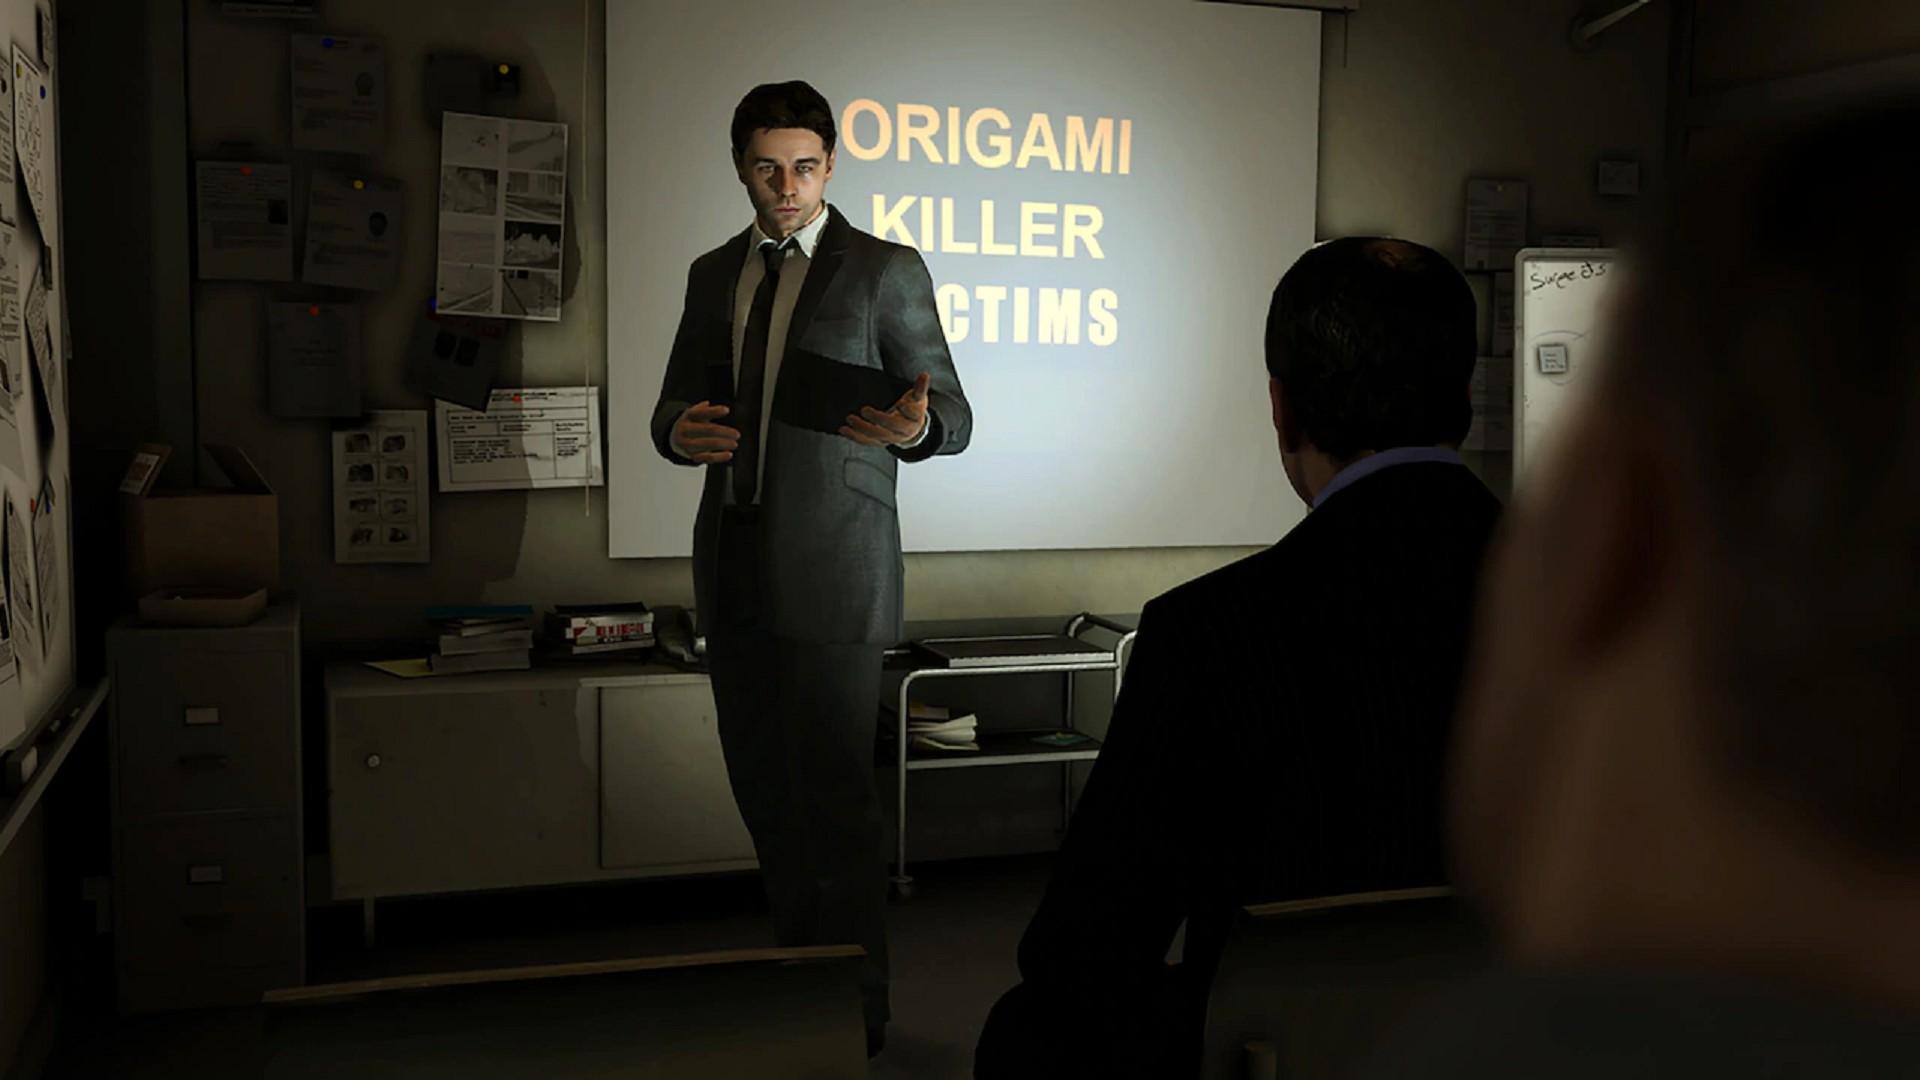 Heavy Rain: The Origami Killer (2010 video game) | 1080x1920